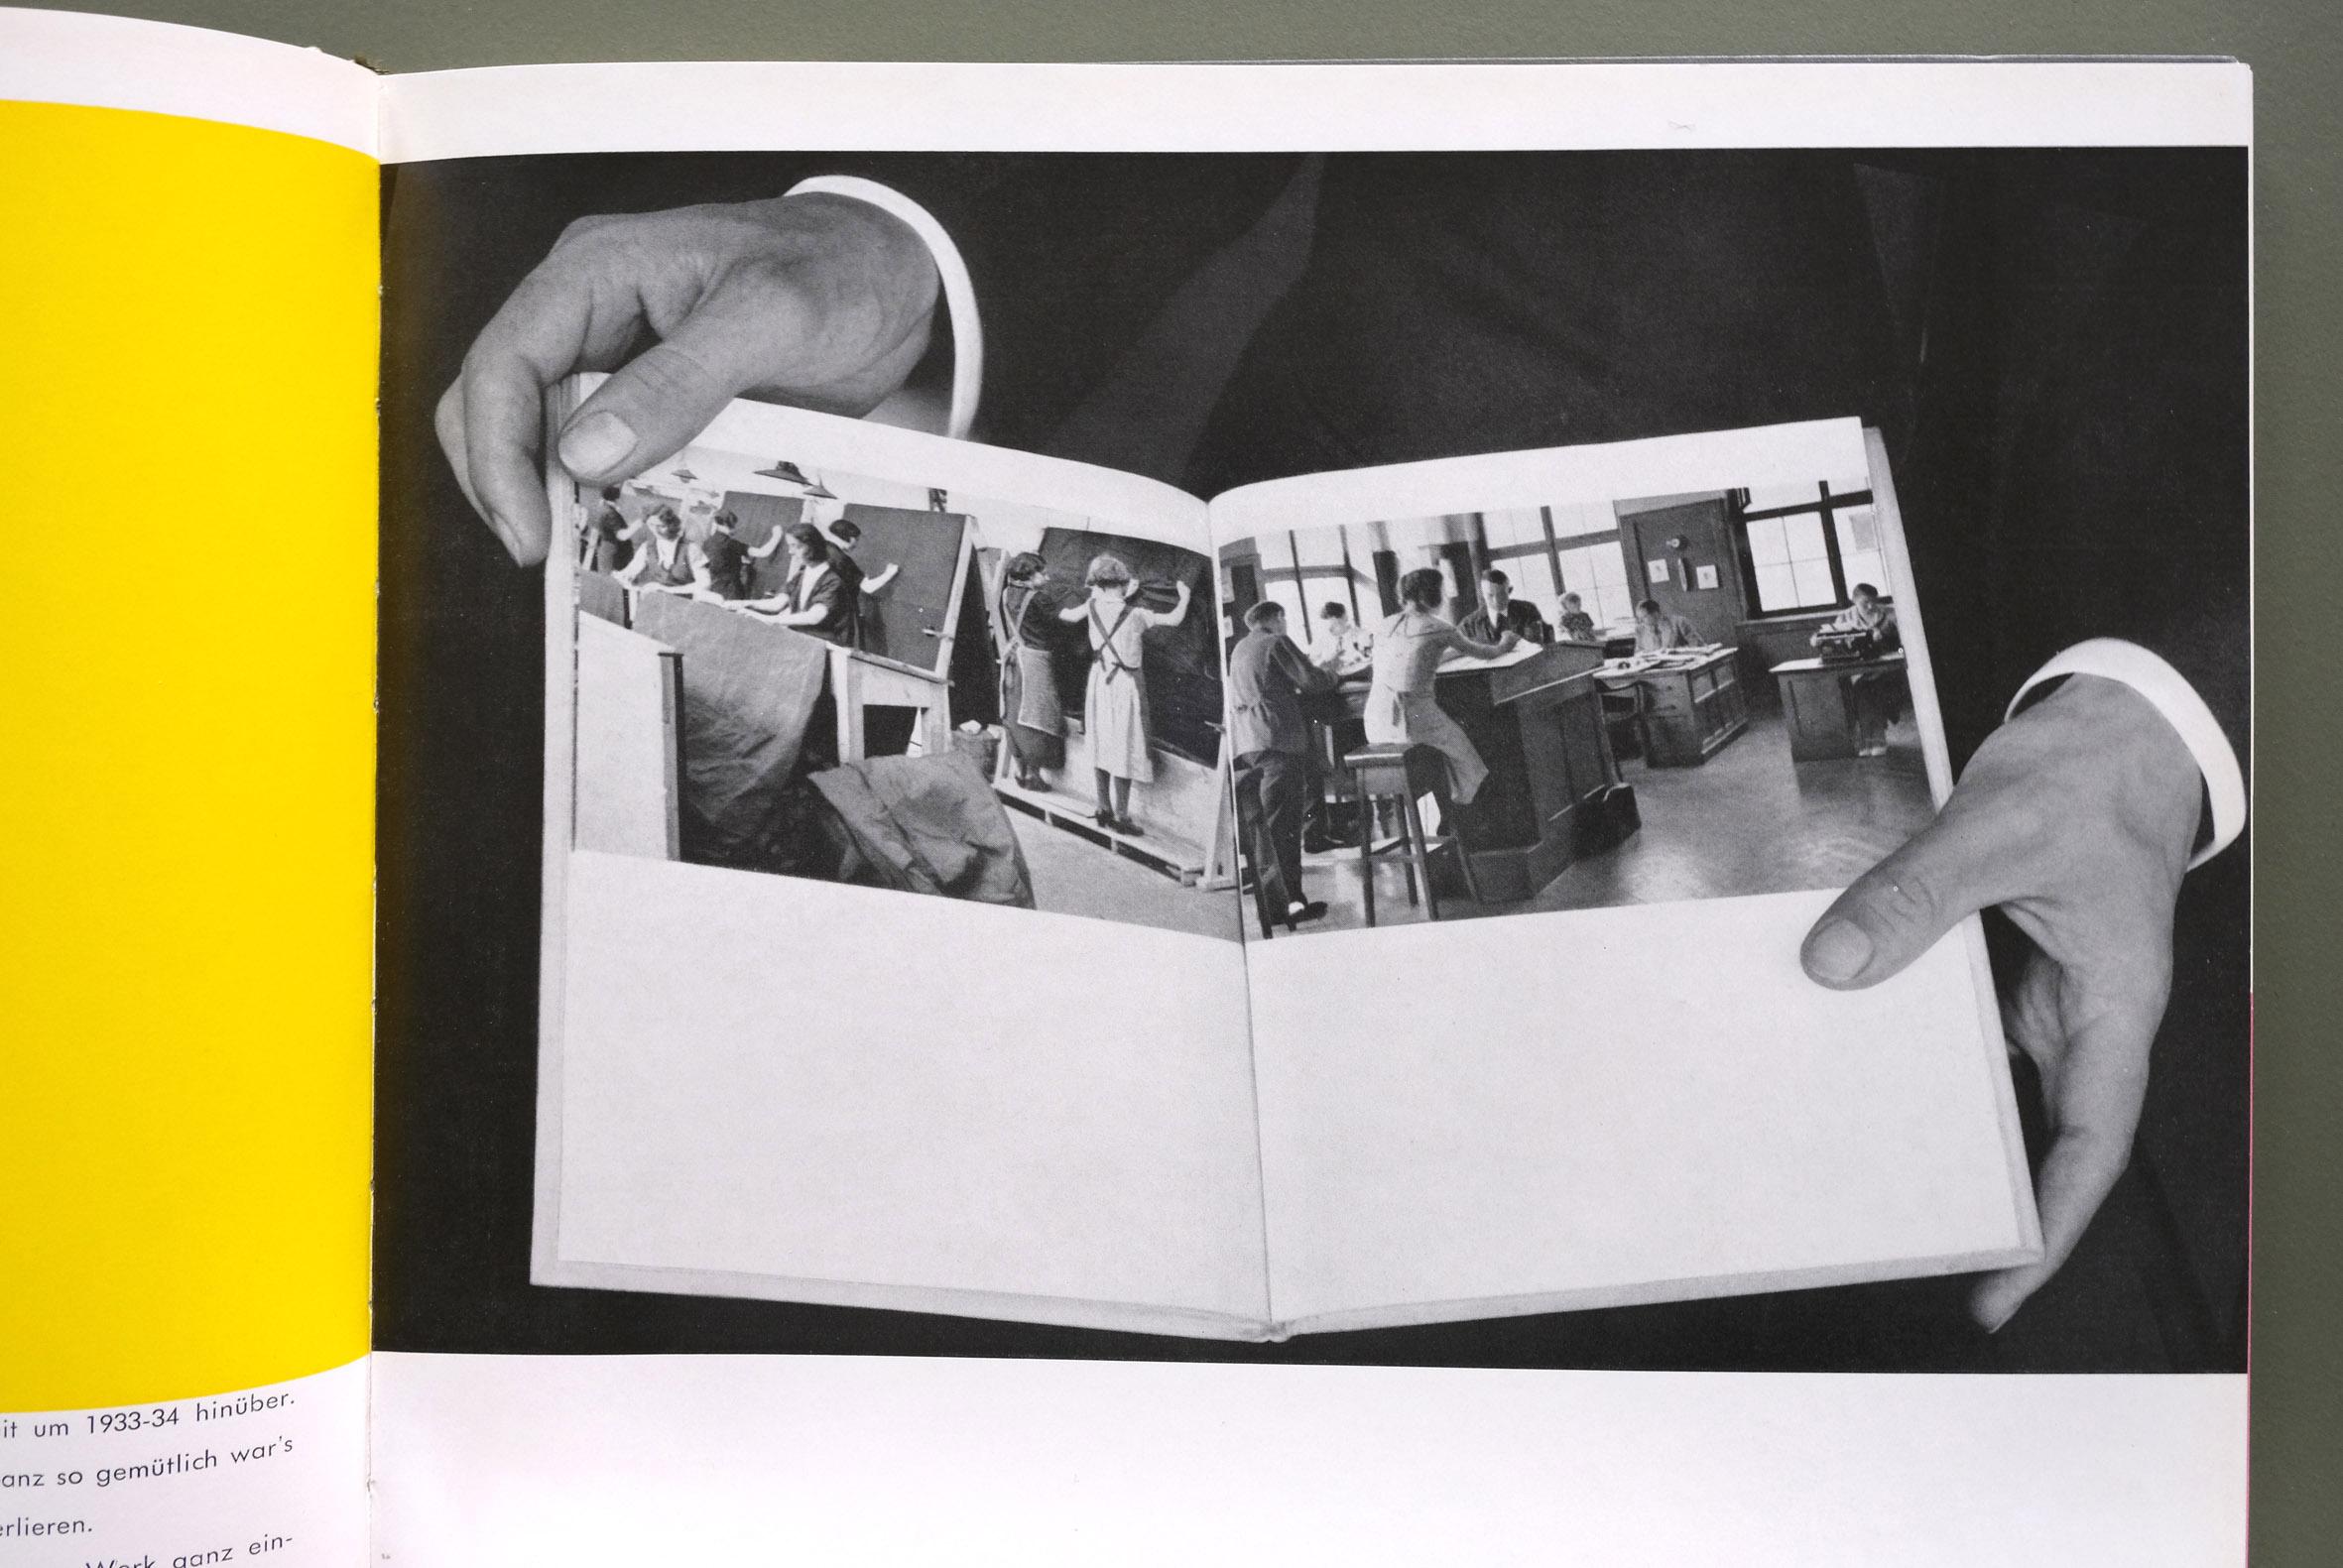 Companybooks as Photobooks